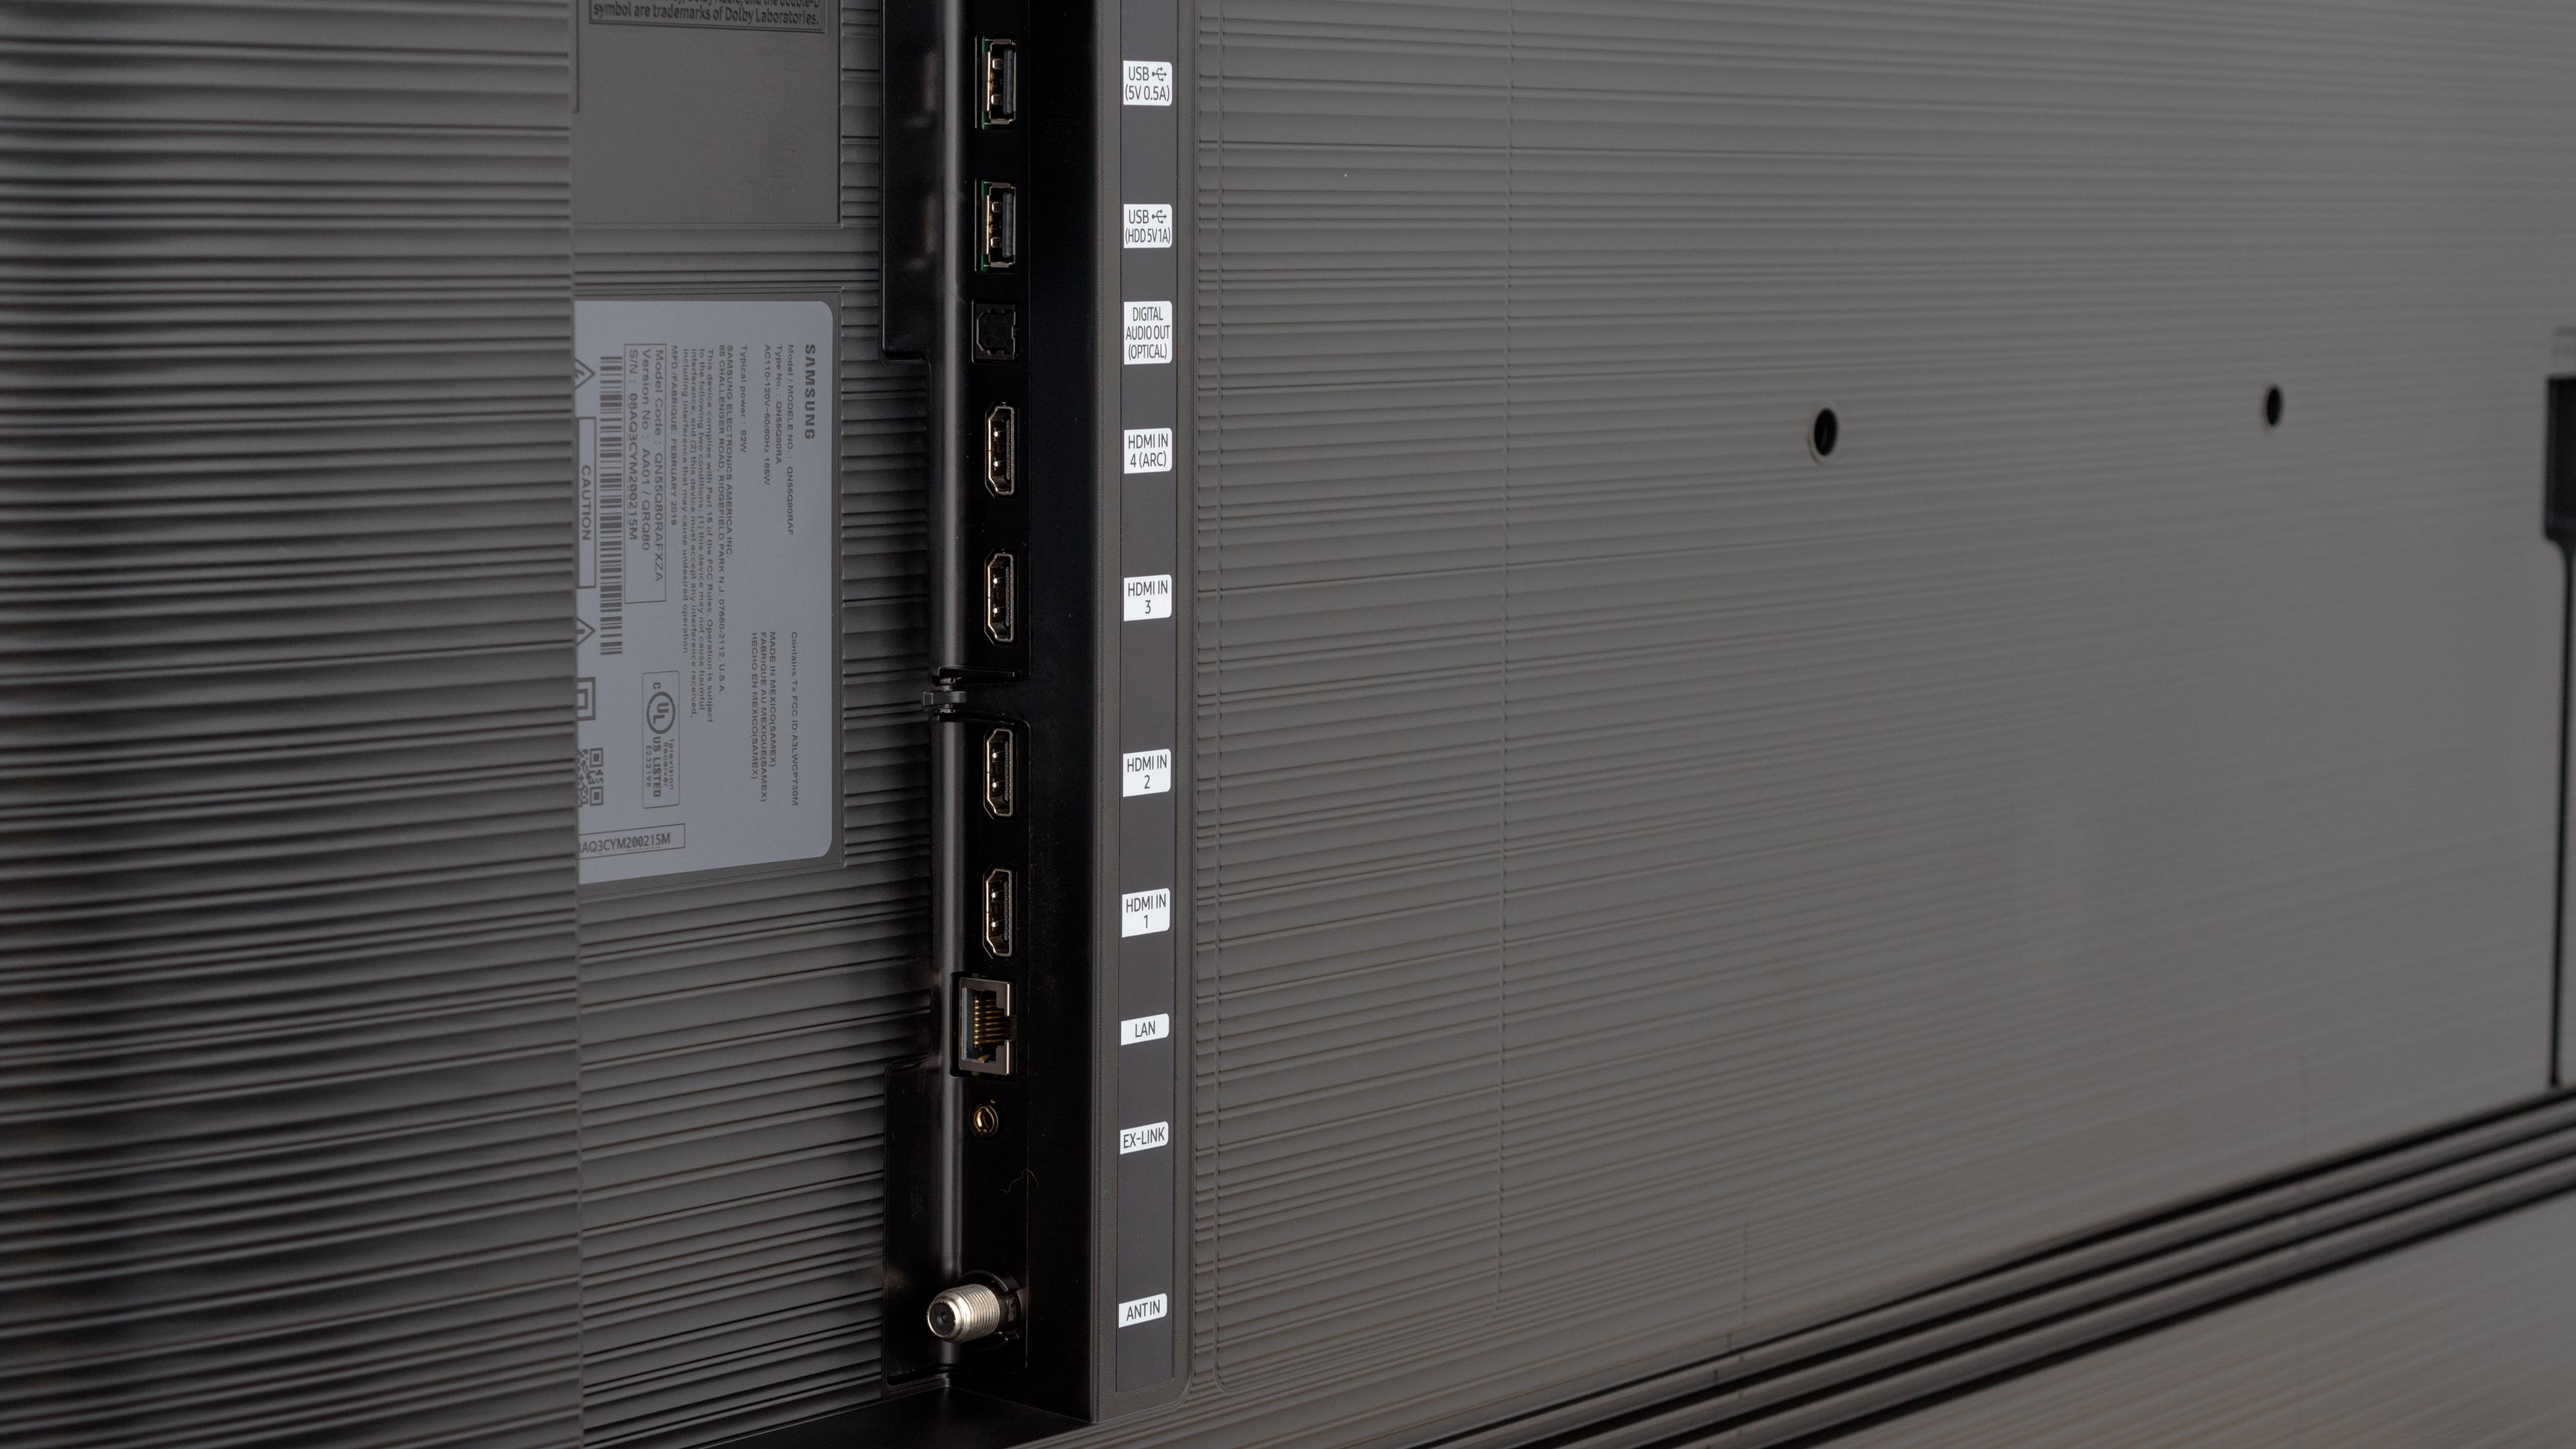 Samsung Q80 Q80r Qled Review Qn55q80r Qn65q80r Qn75q80r